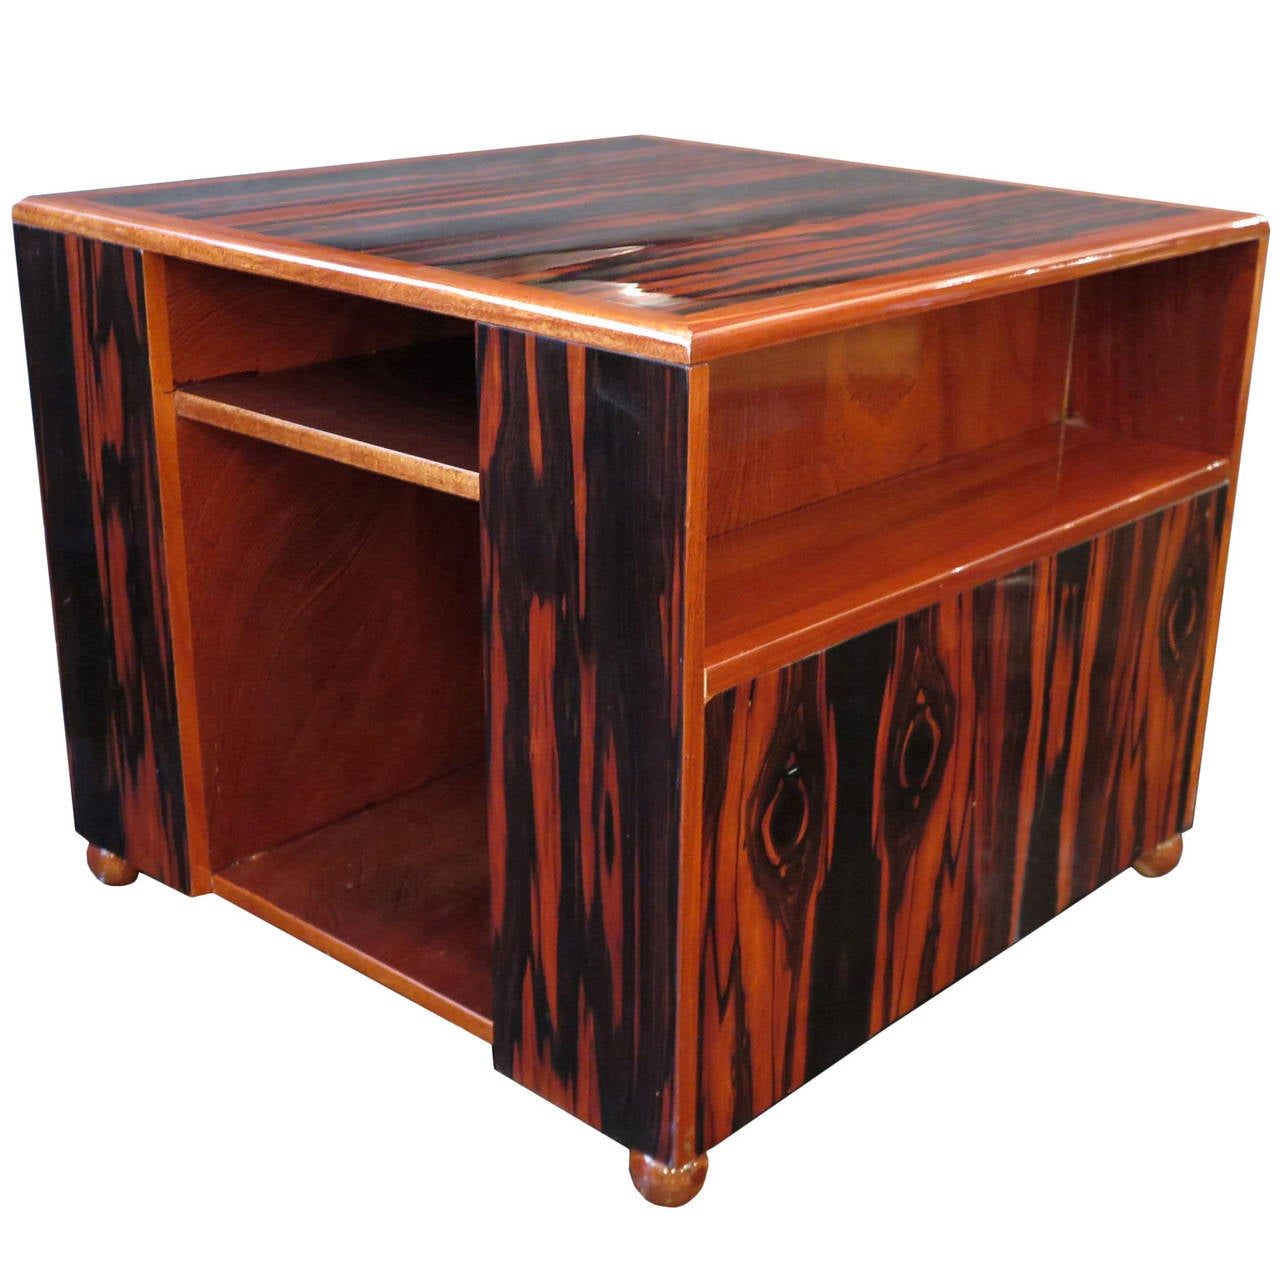 French Art Deco Macassar Ebony Table